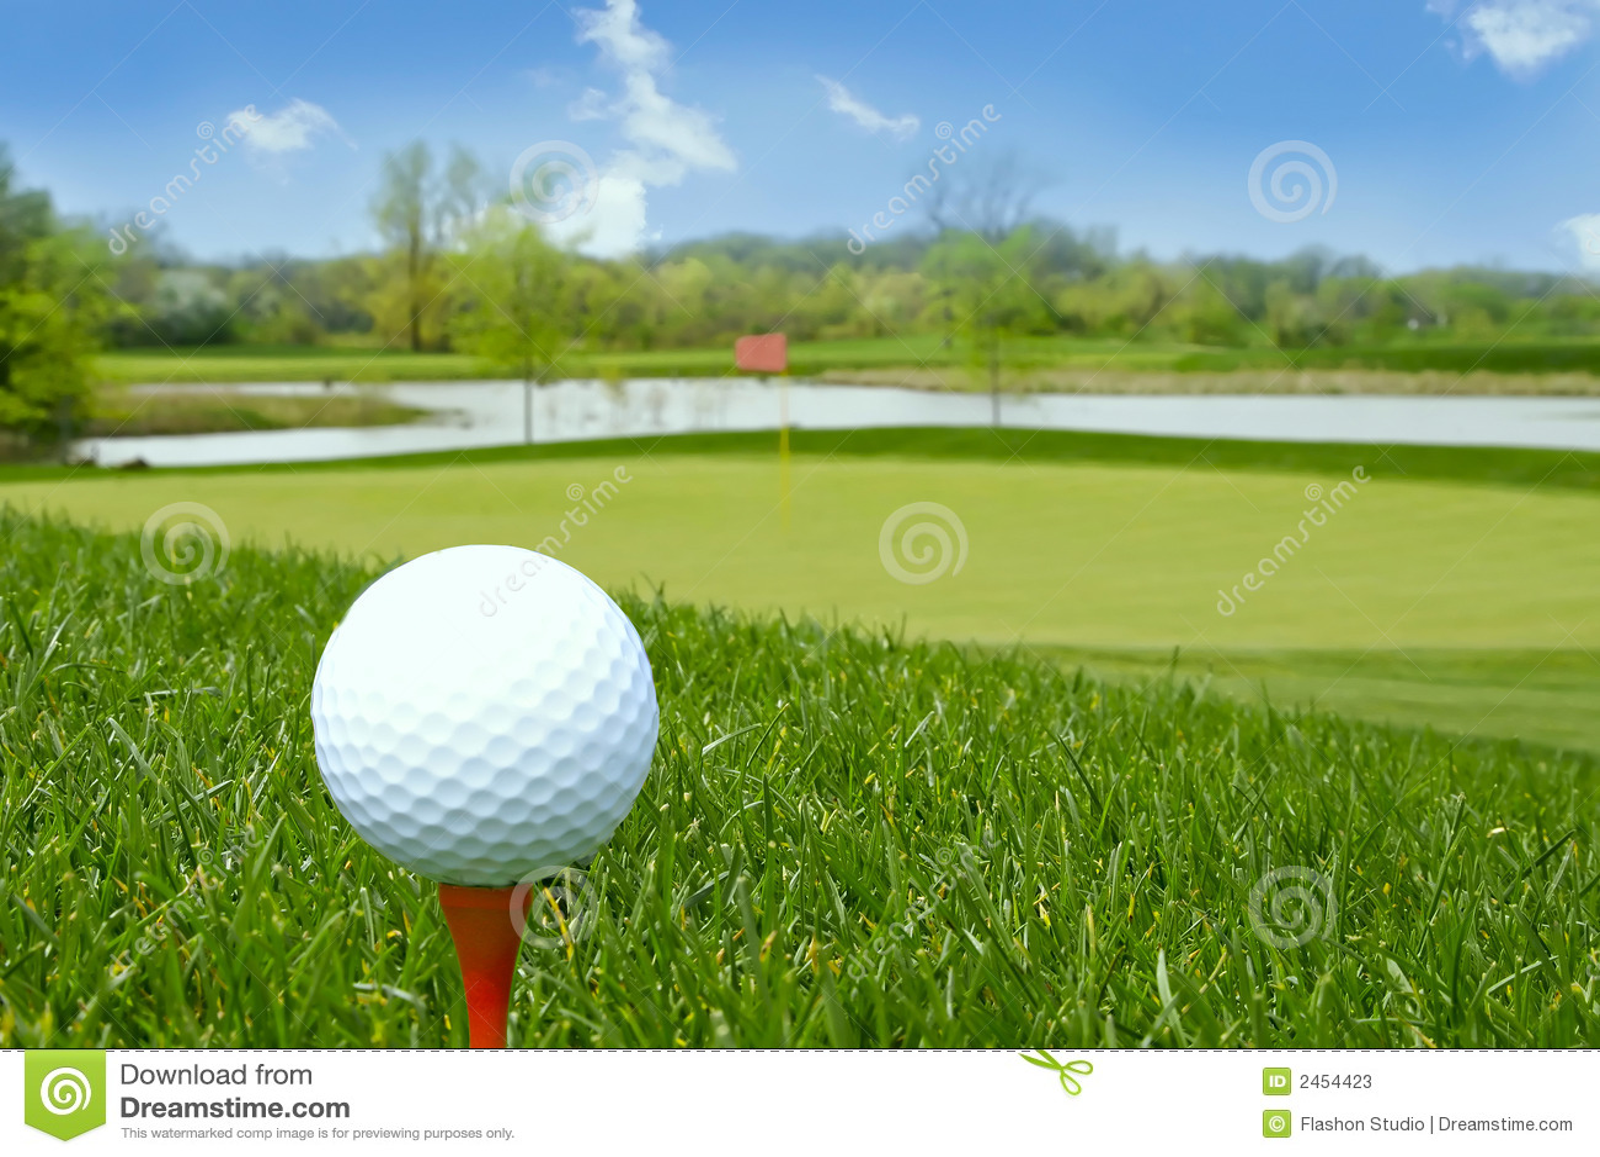 Golf ball on the ground